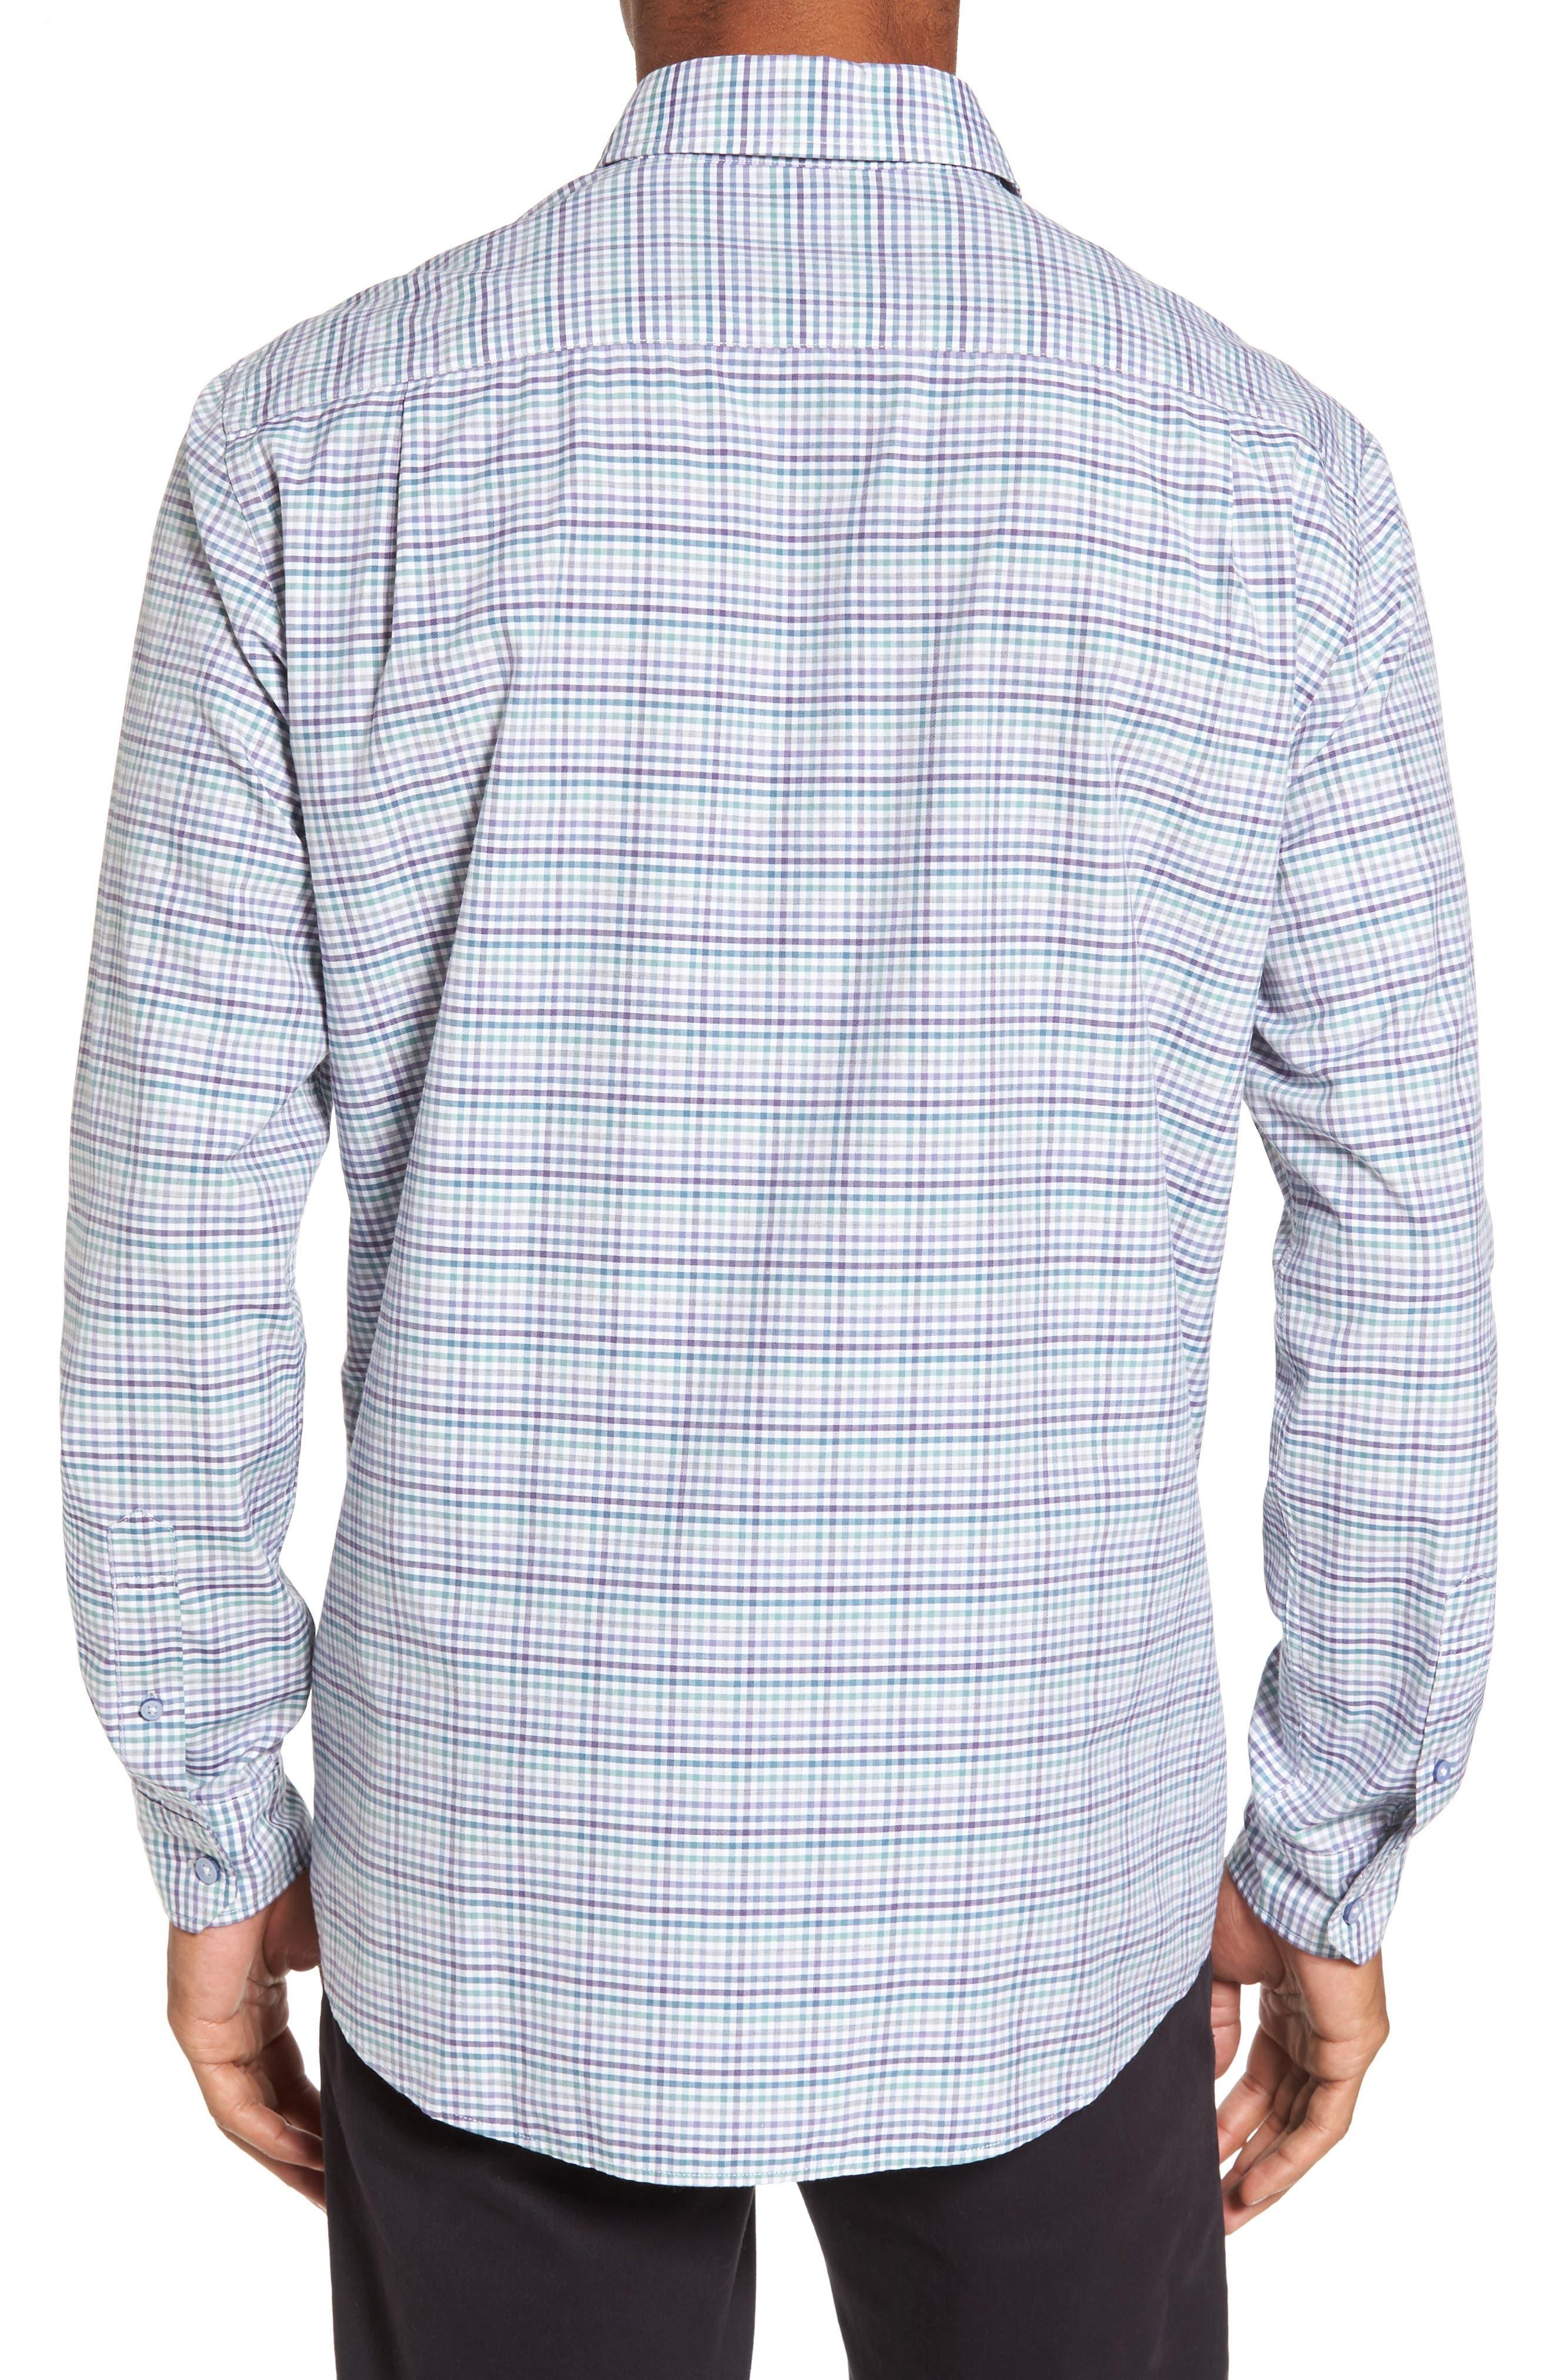 Woodlaw Original Fit Check Sport Shirt,                             Alternate thumbnail 4, color,